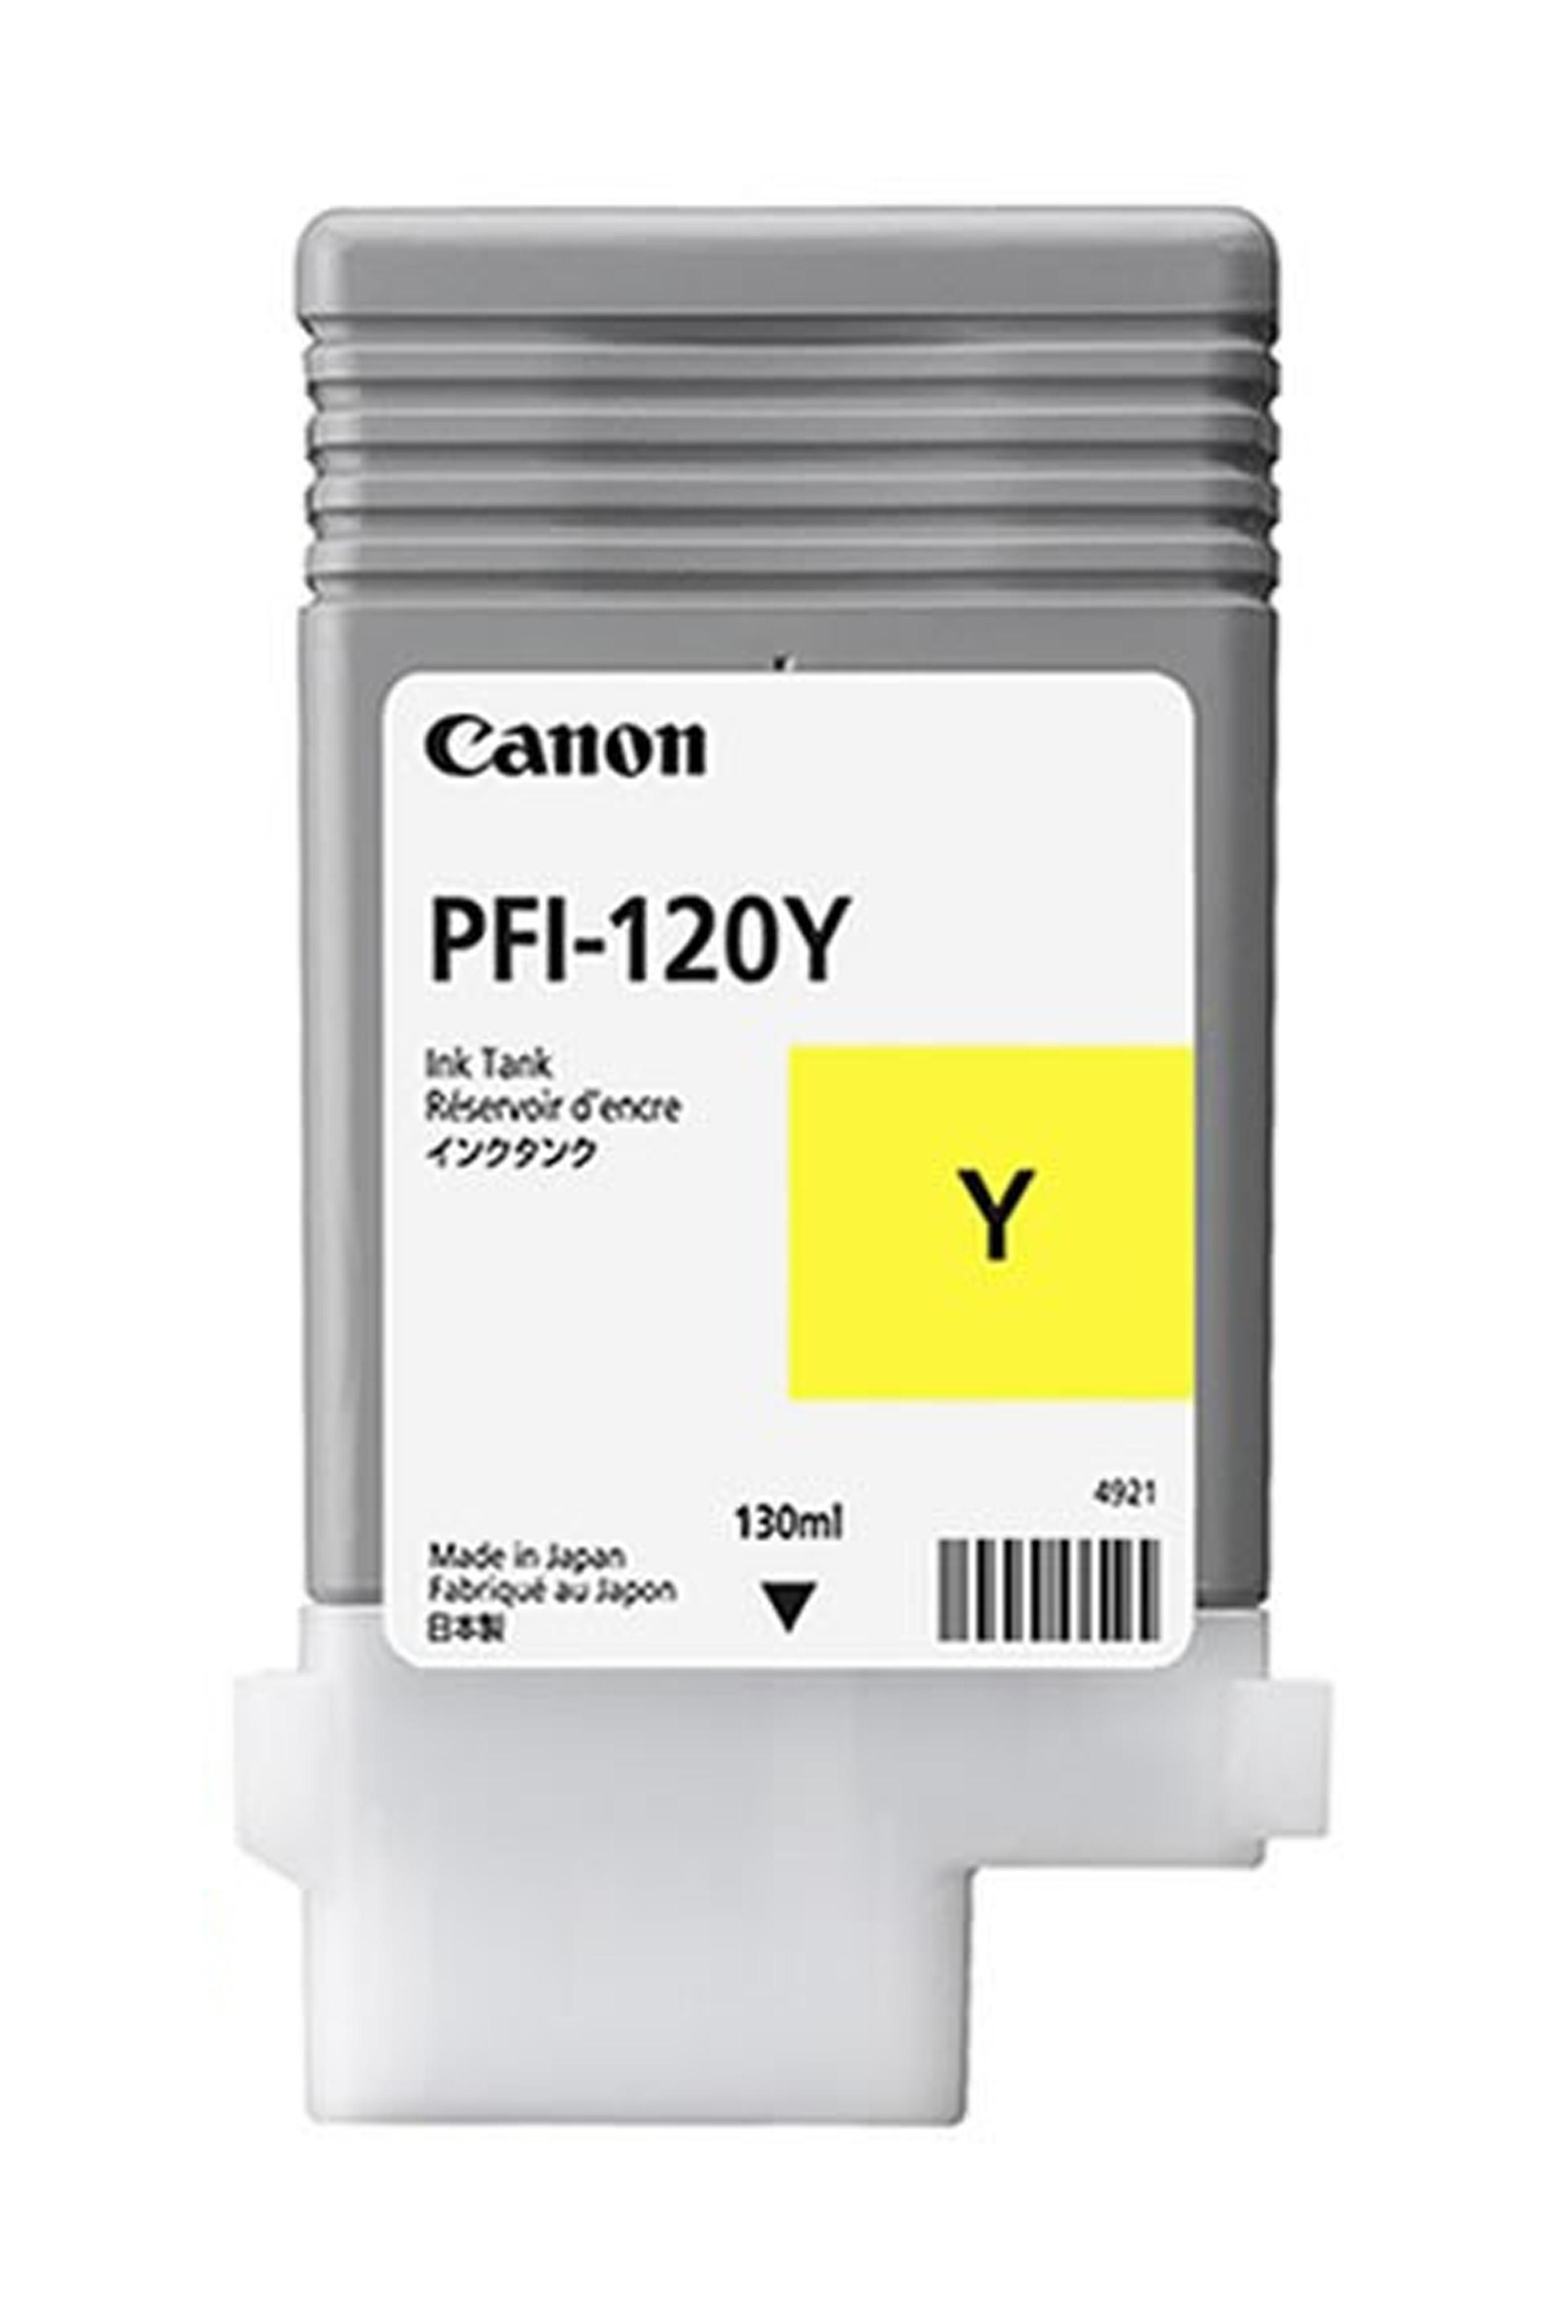 Canon Ink Tank PFI-120Y Pigment Yellow Ink Tank 130ml (2888C001AA)